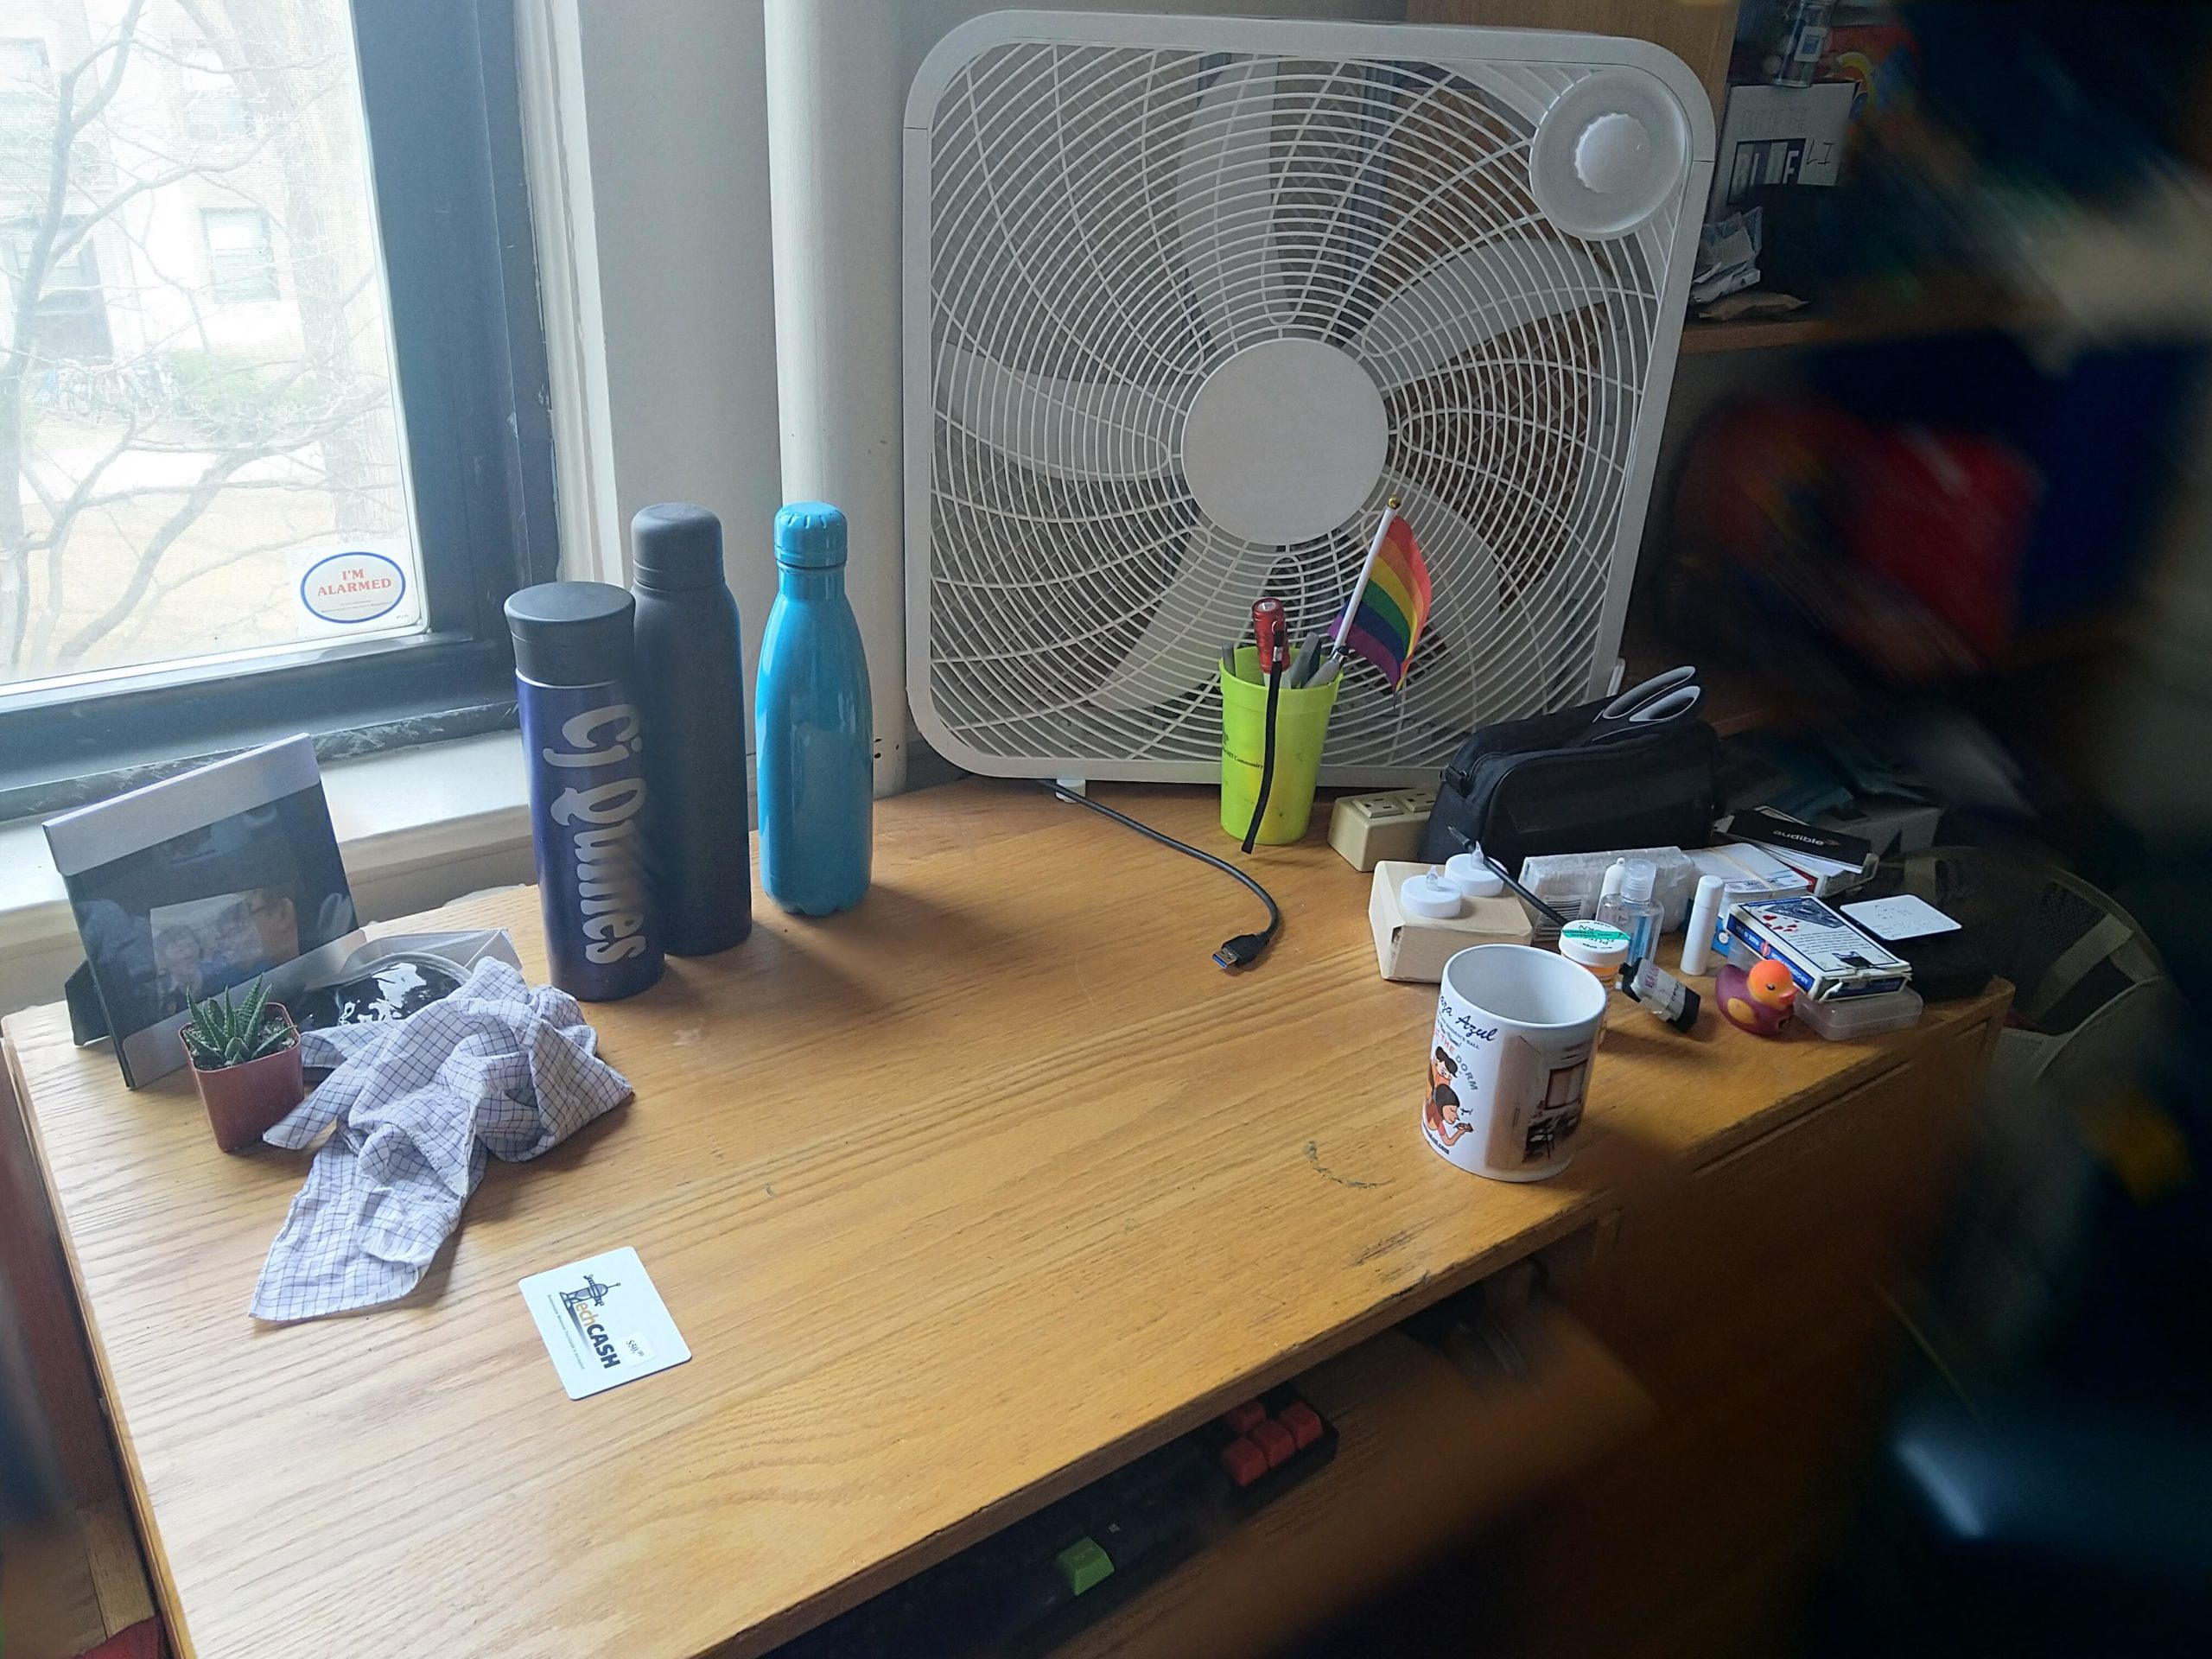 my desk. there's a box fan, three water bottles, a mug, a keyboard.